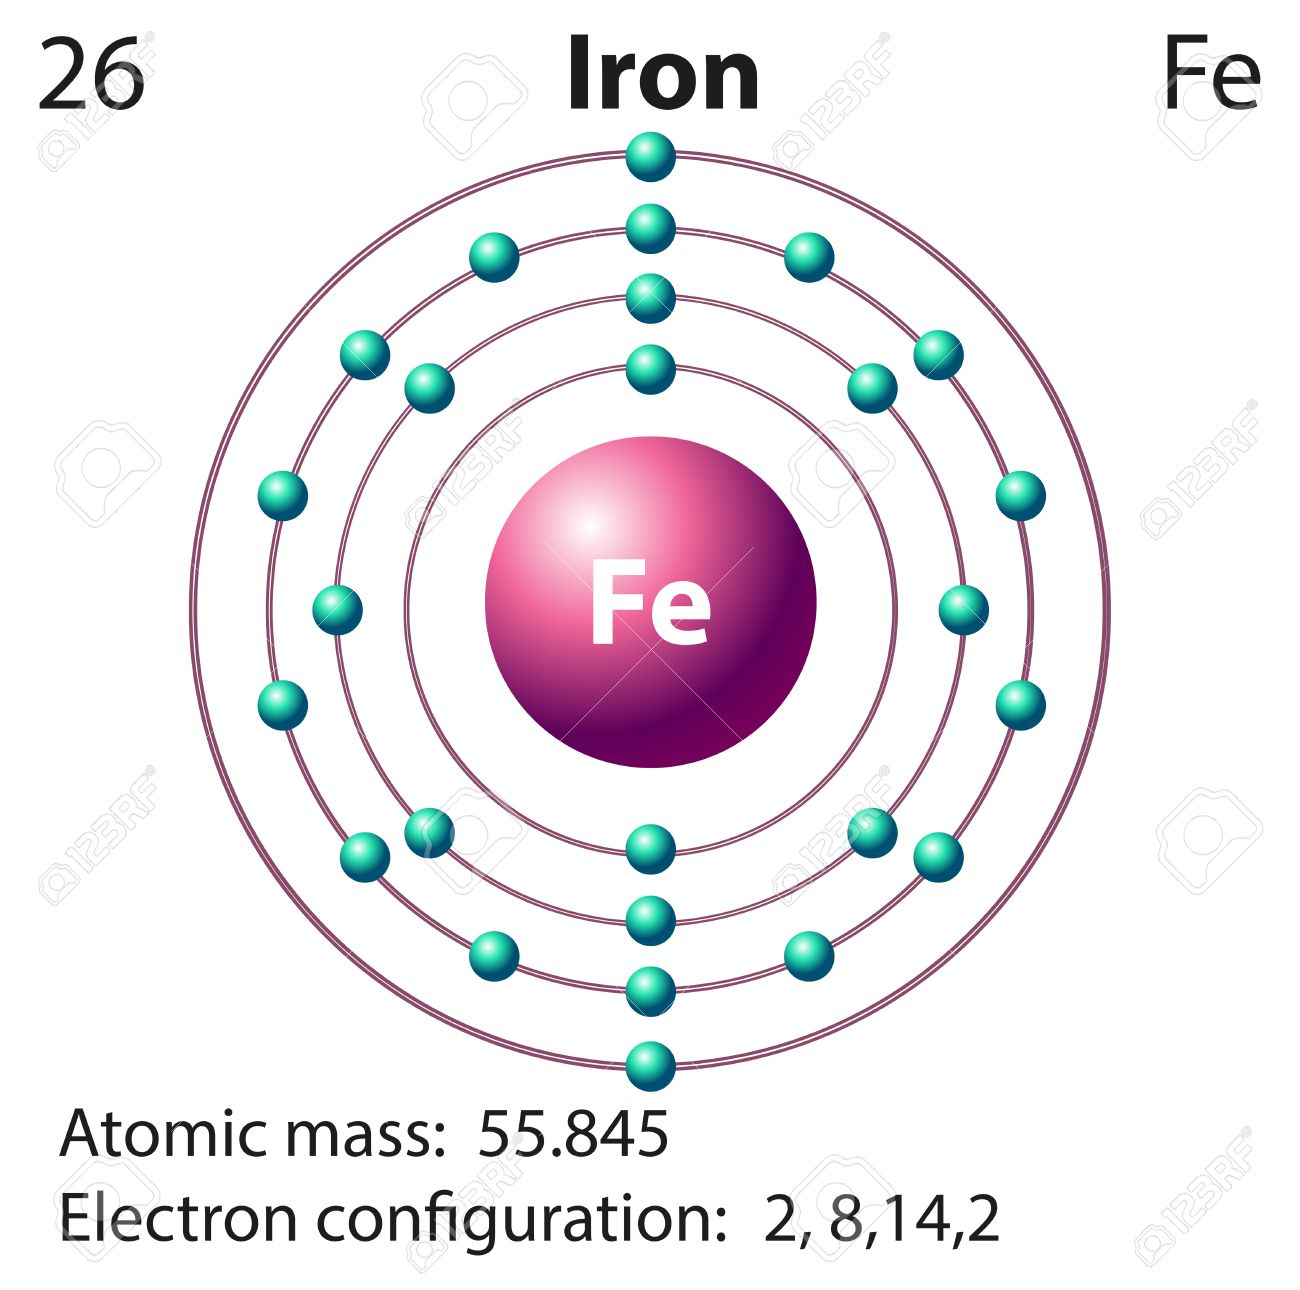 Flashcard of iron with atomic mass illustration royalty free flashcard of iron with atomic mass illustration stock vector 45062496 buycottarizona Image collections